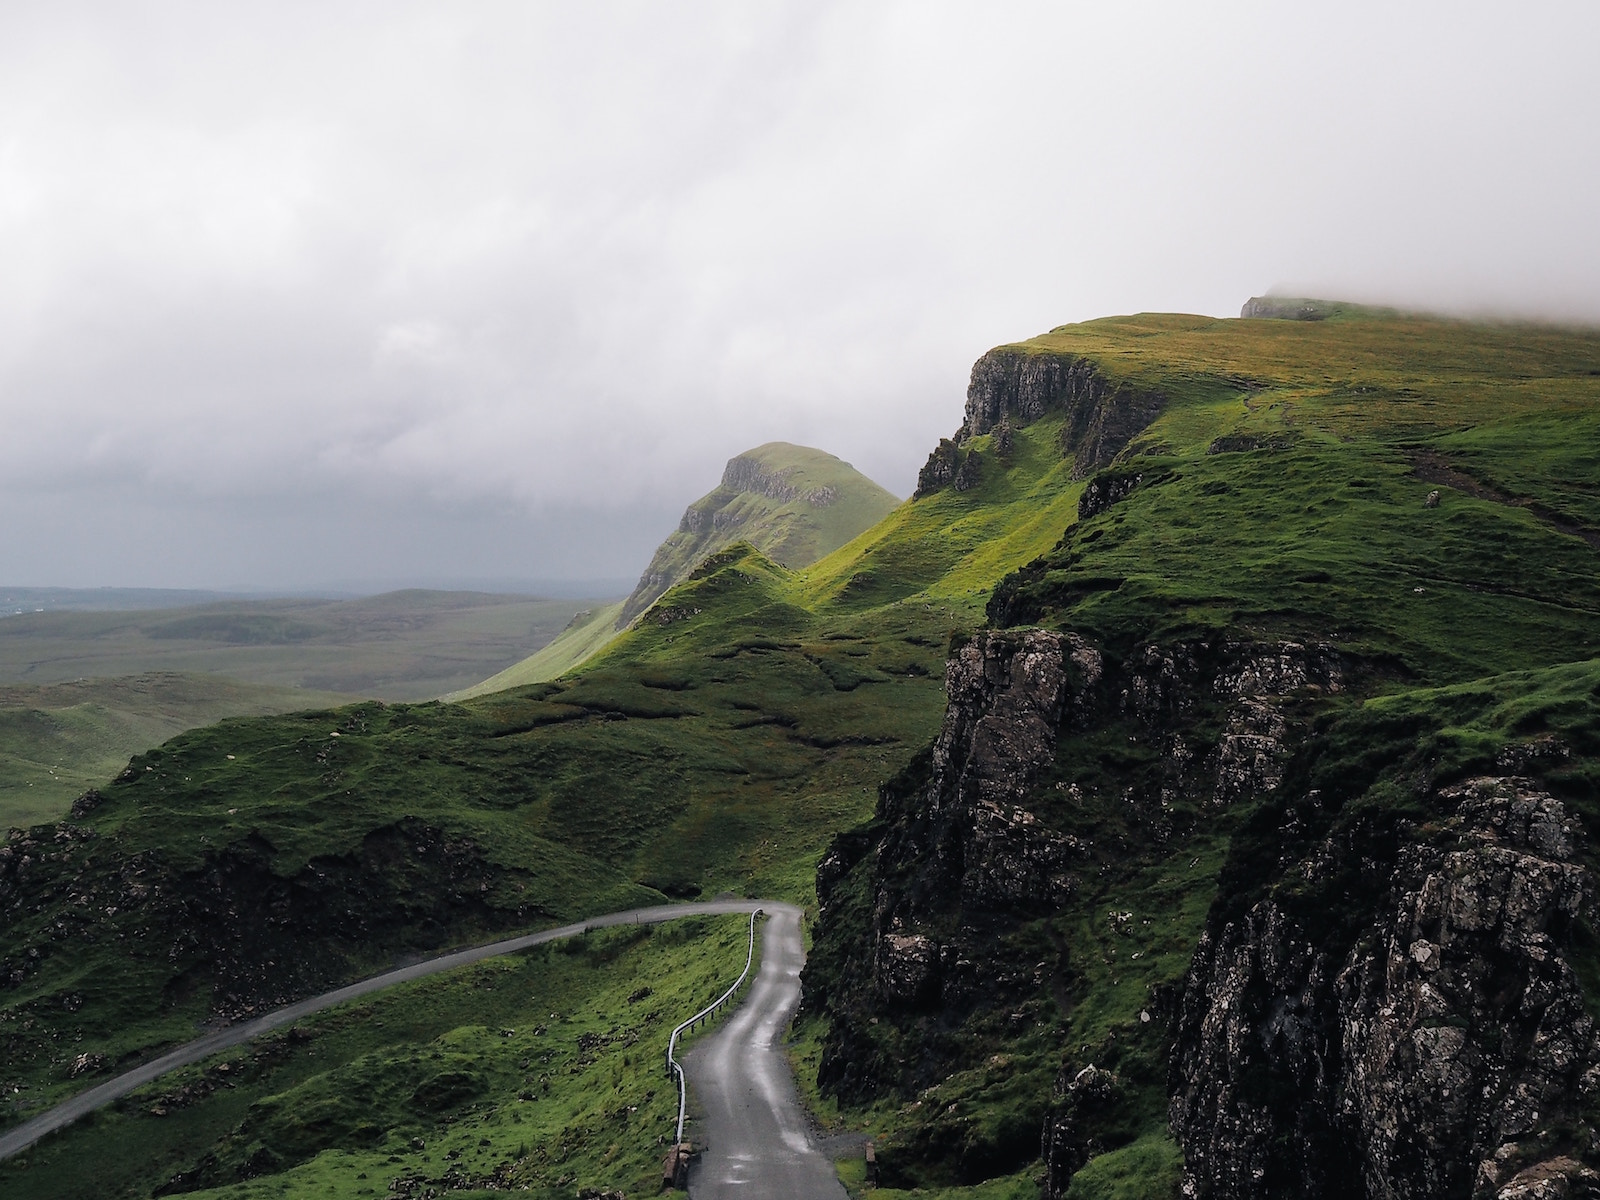 redhead-round-the-world-blogger-ireland-destinations-green-road-drive.jpg